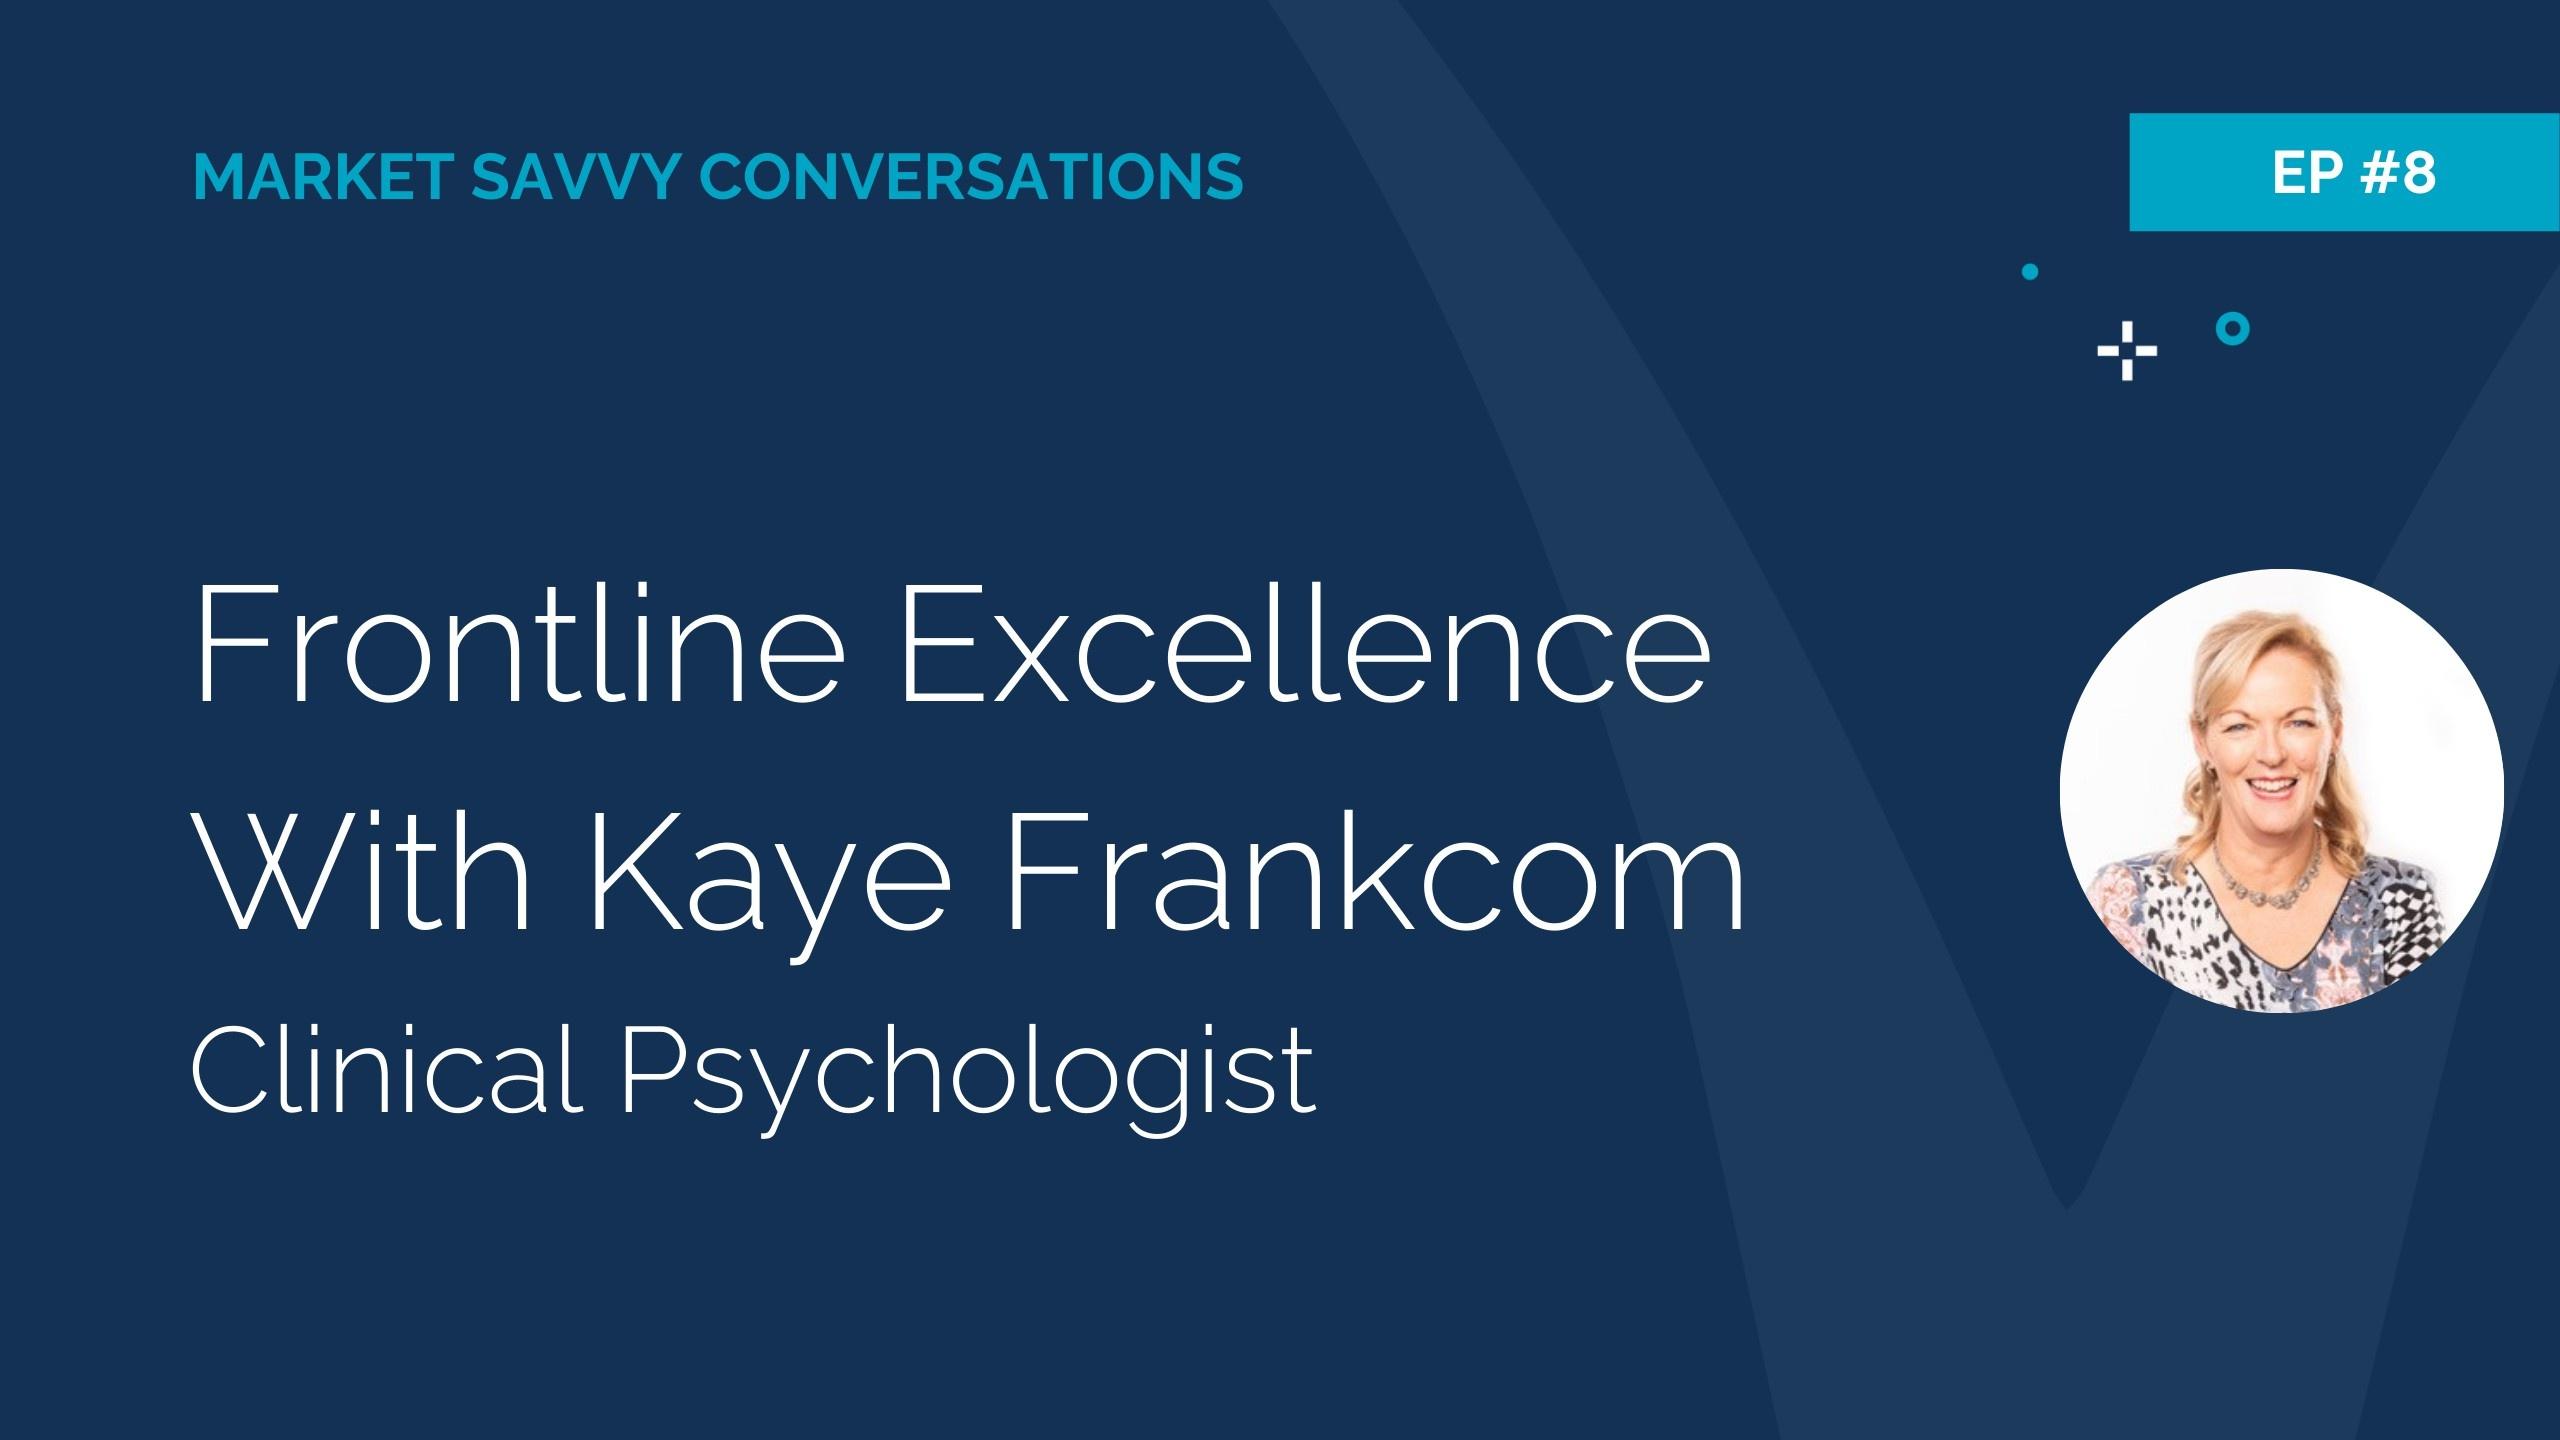 Megan Walker from Market Savvy Interviews Kaye Frankcom about Frontline Excellence